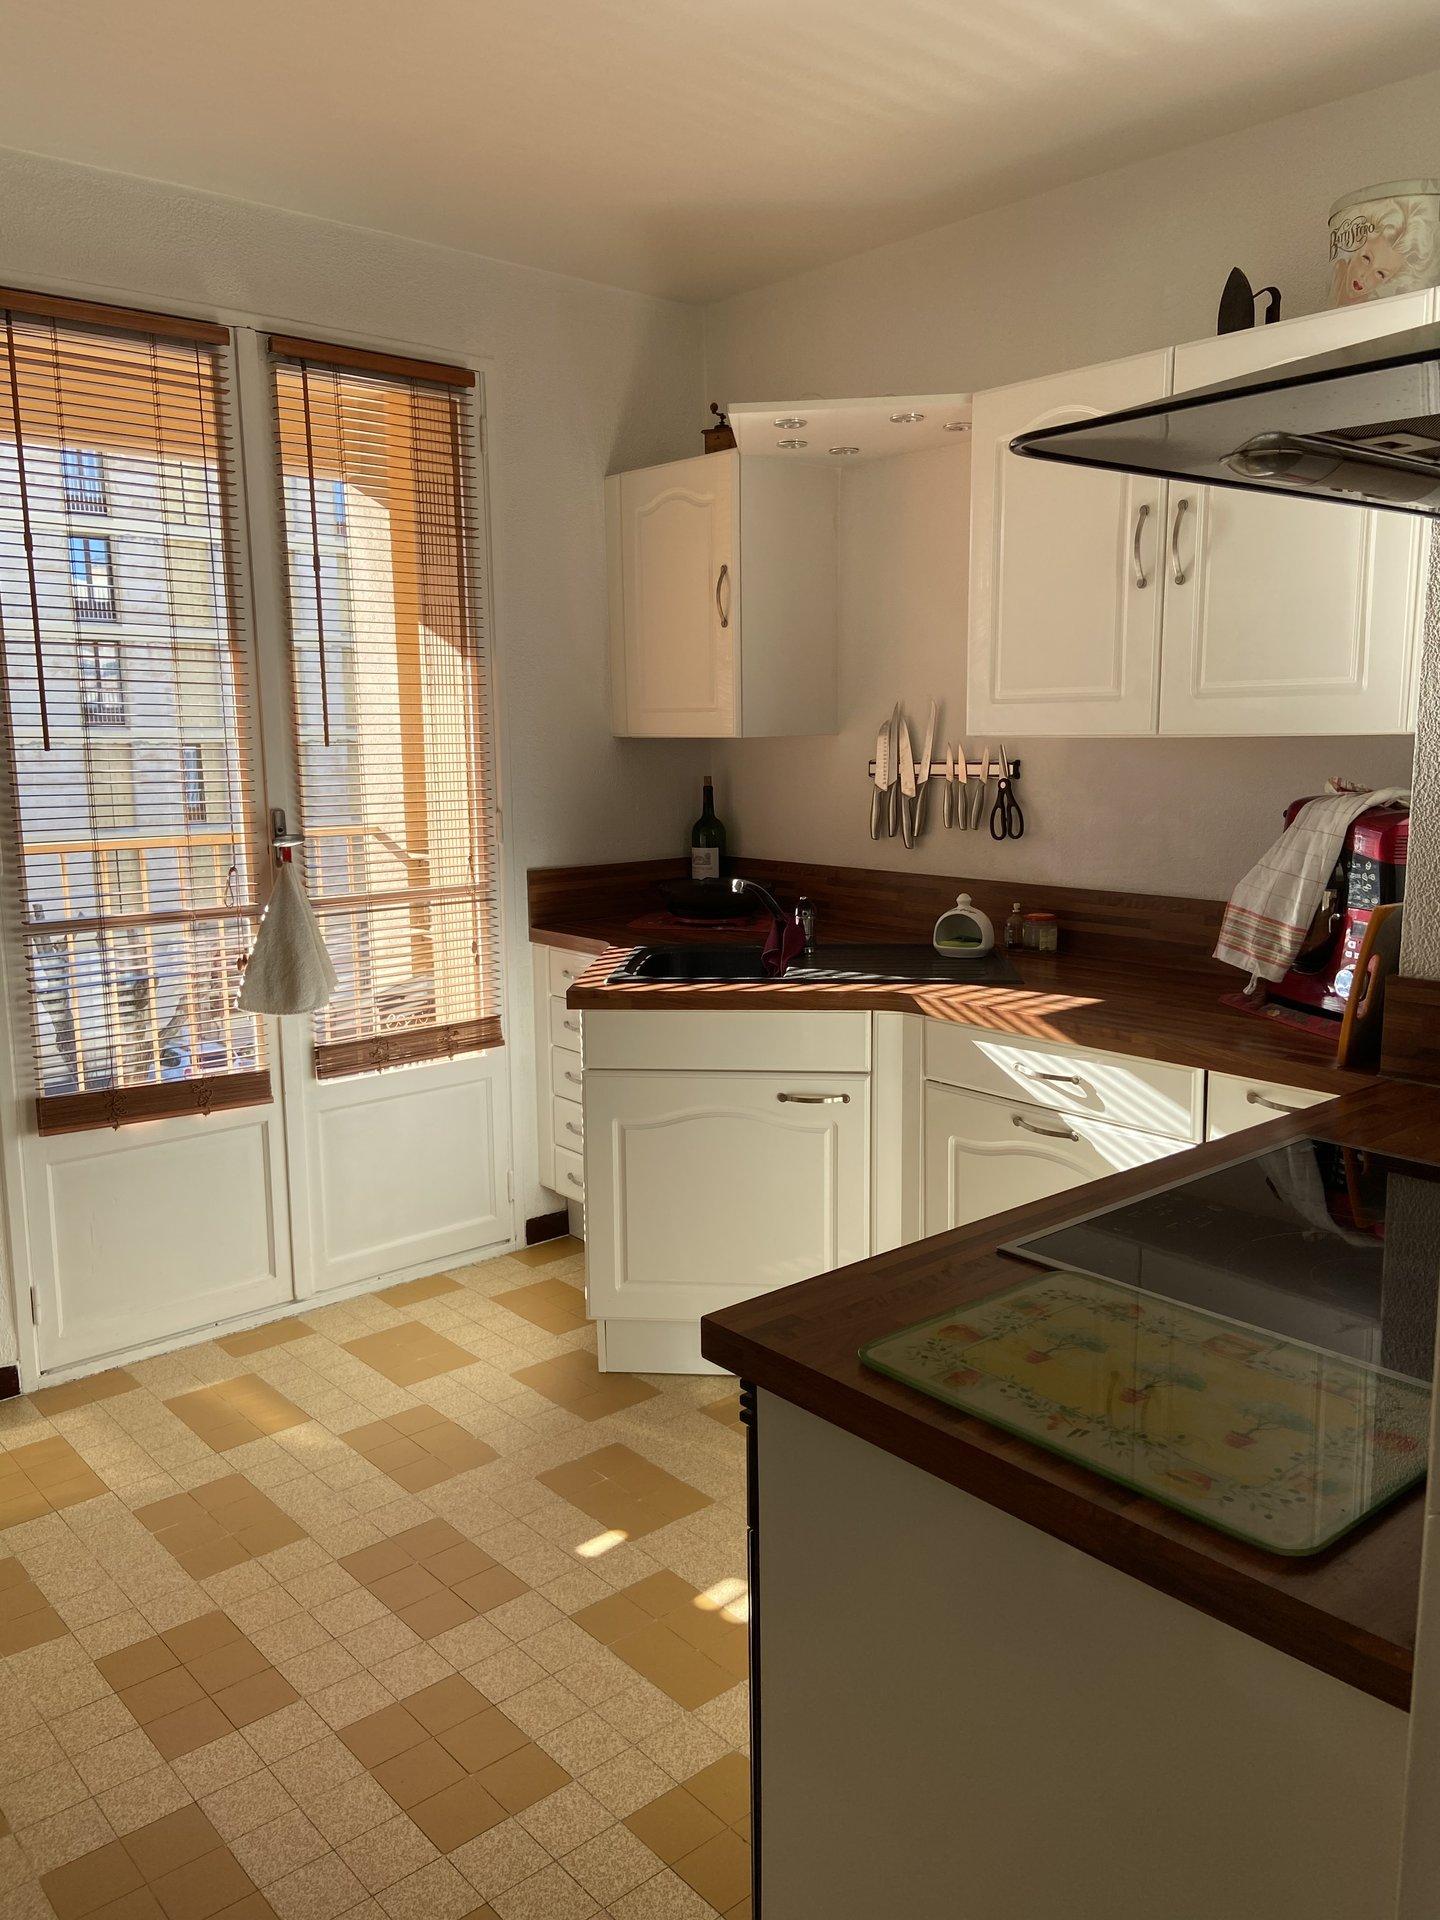 Appartement de type 3 13010 Marseille